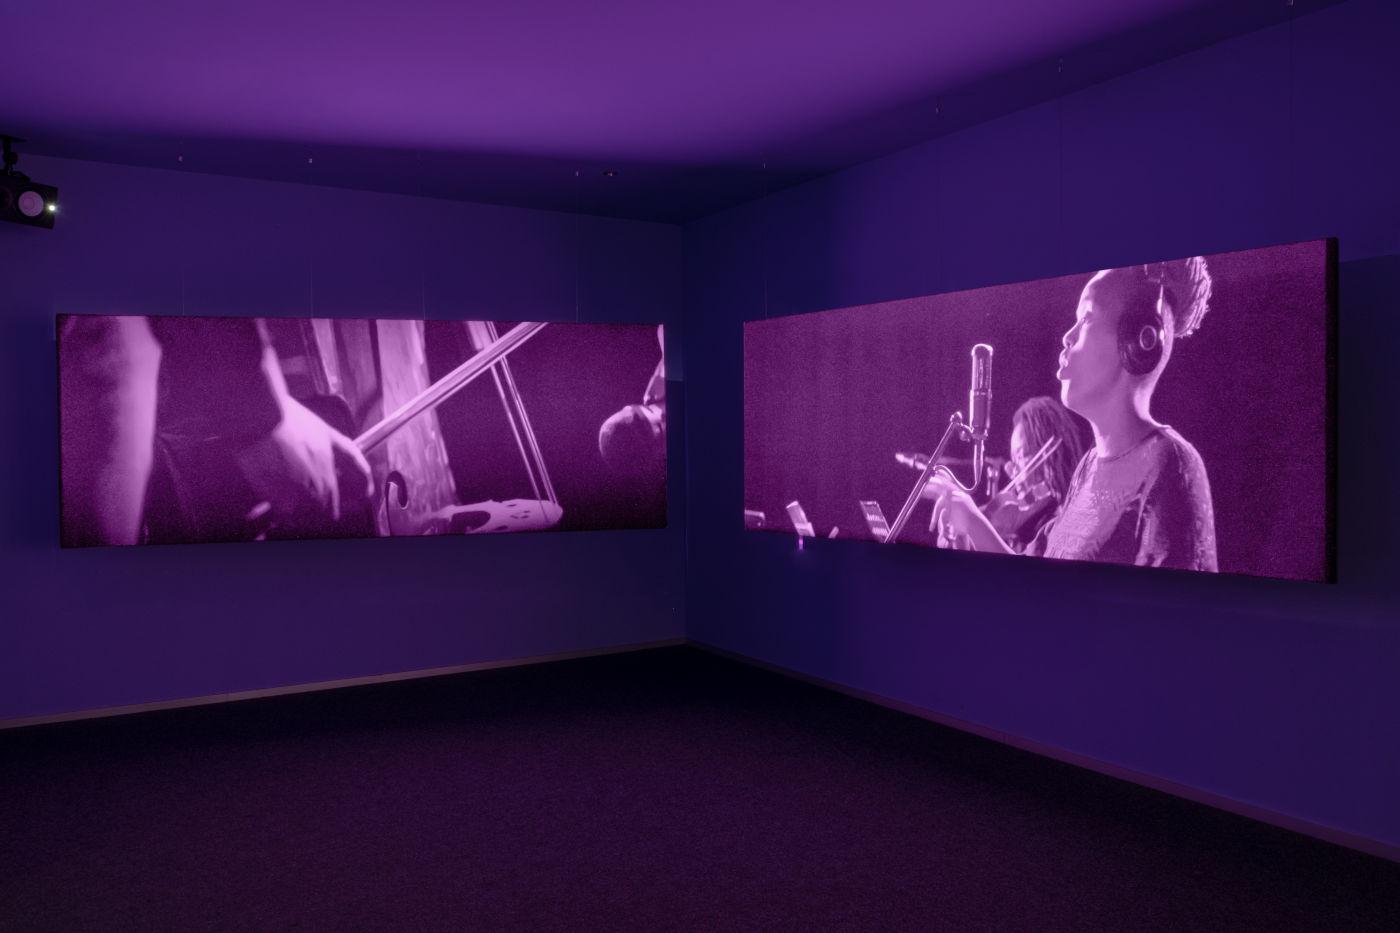 Una foto della mostra alla Goodman Gallery